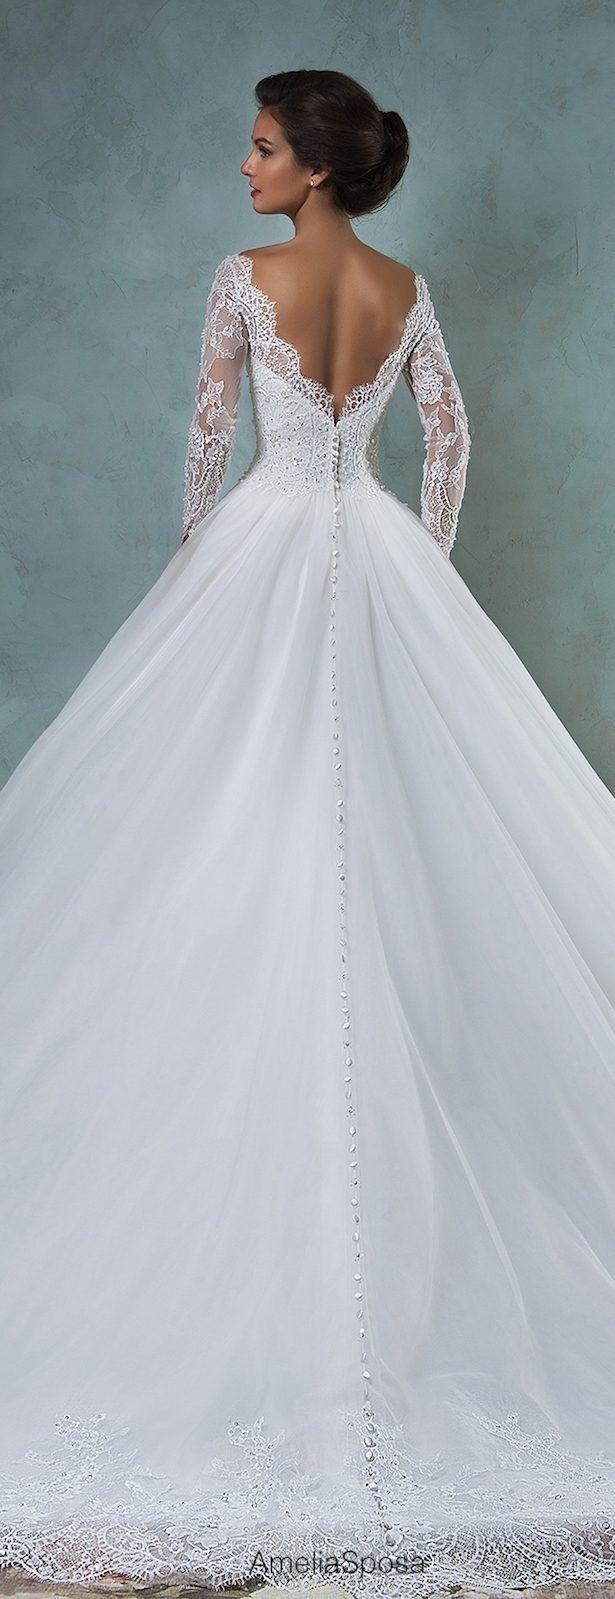 amelia-sposa-wedding-dress-2016o-e1474402119655.jpg (615×1599)